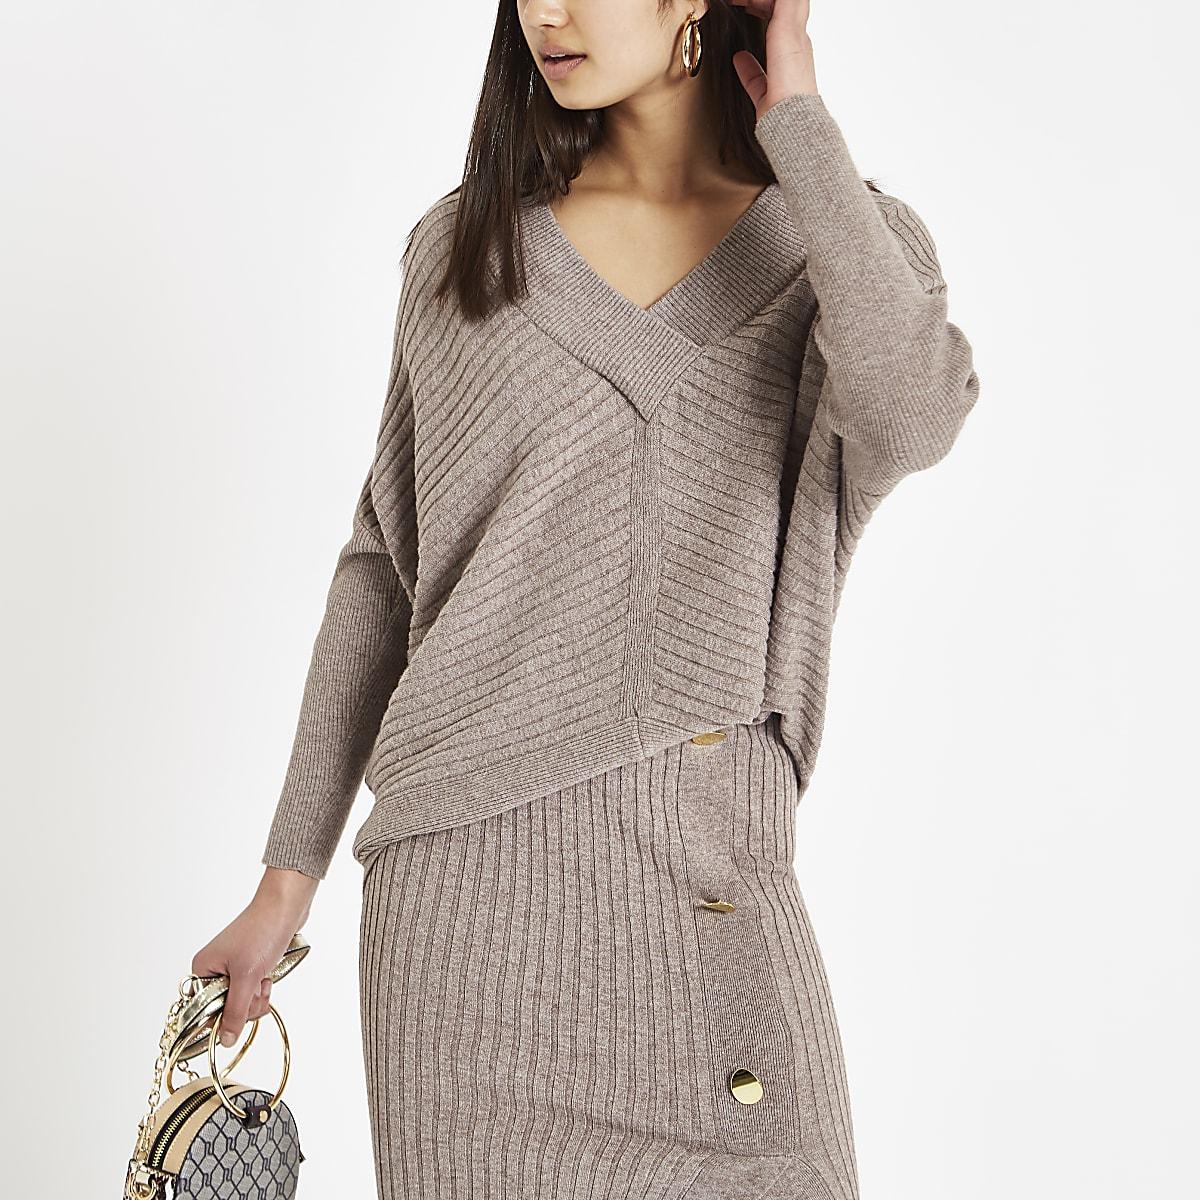 Beige V neck long sleeve sweater